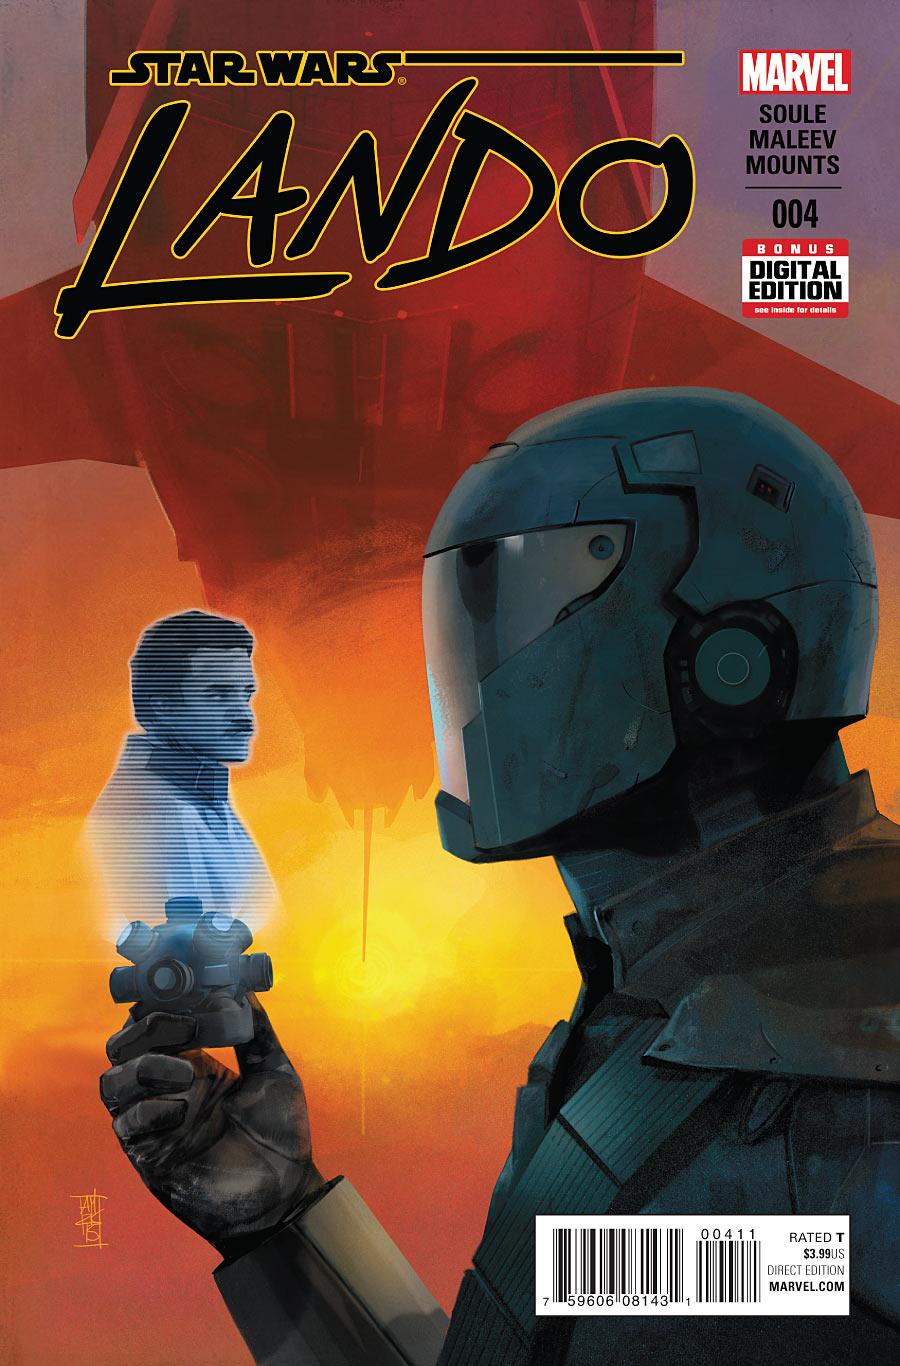 Star Wars: Lando #4